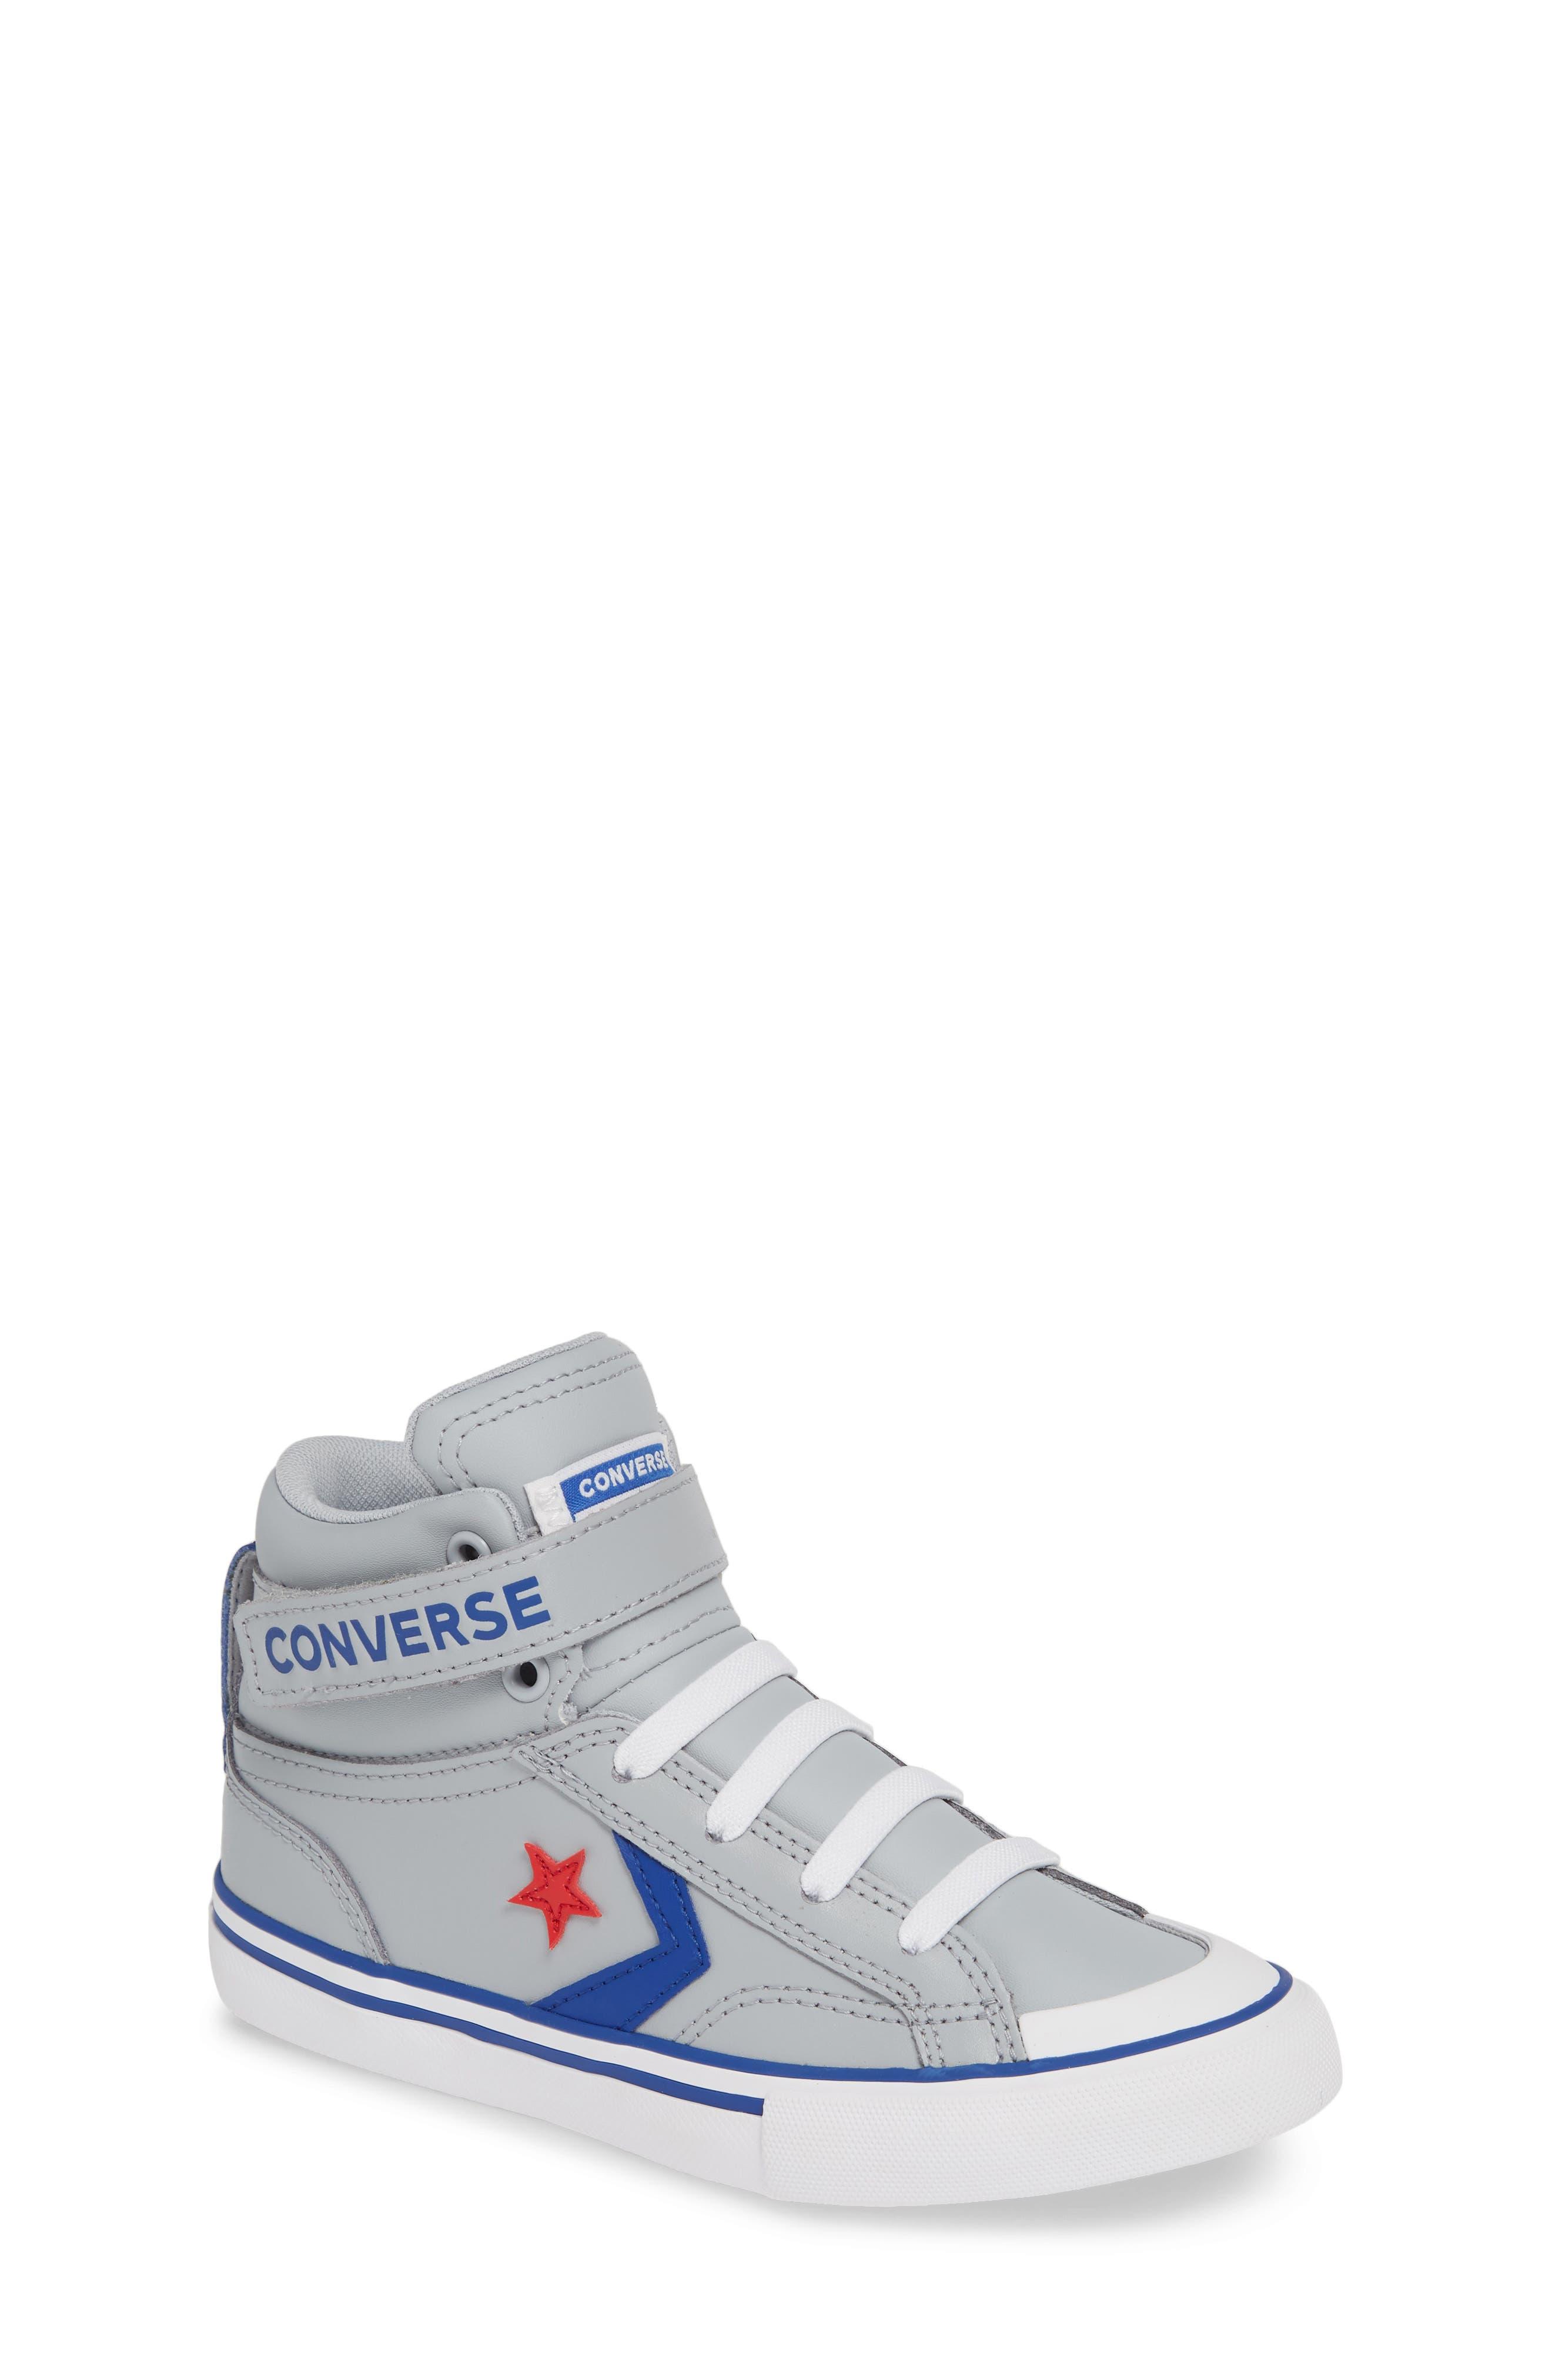 b1fb08c172a4 Converse Kids  Grey Shoes   Snekers